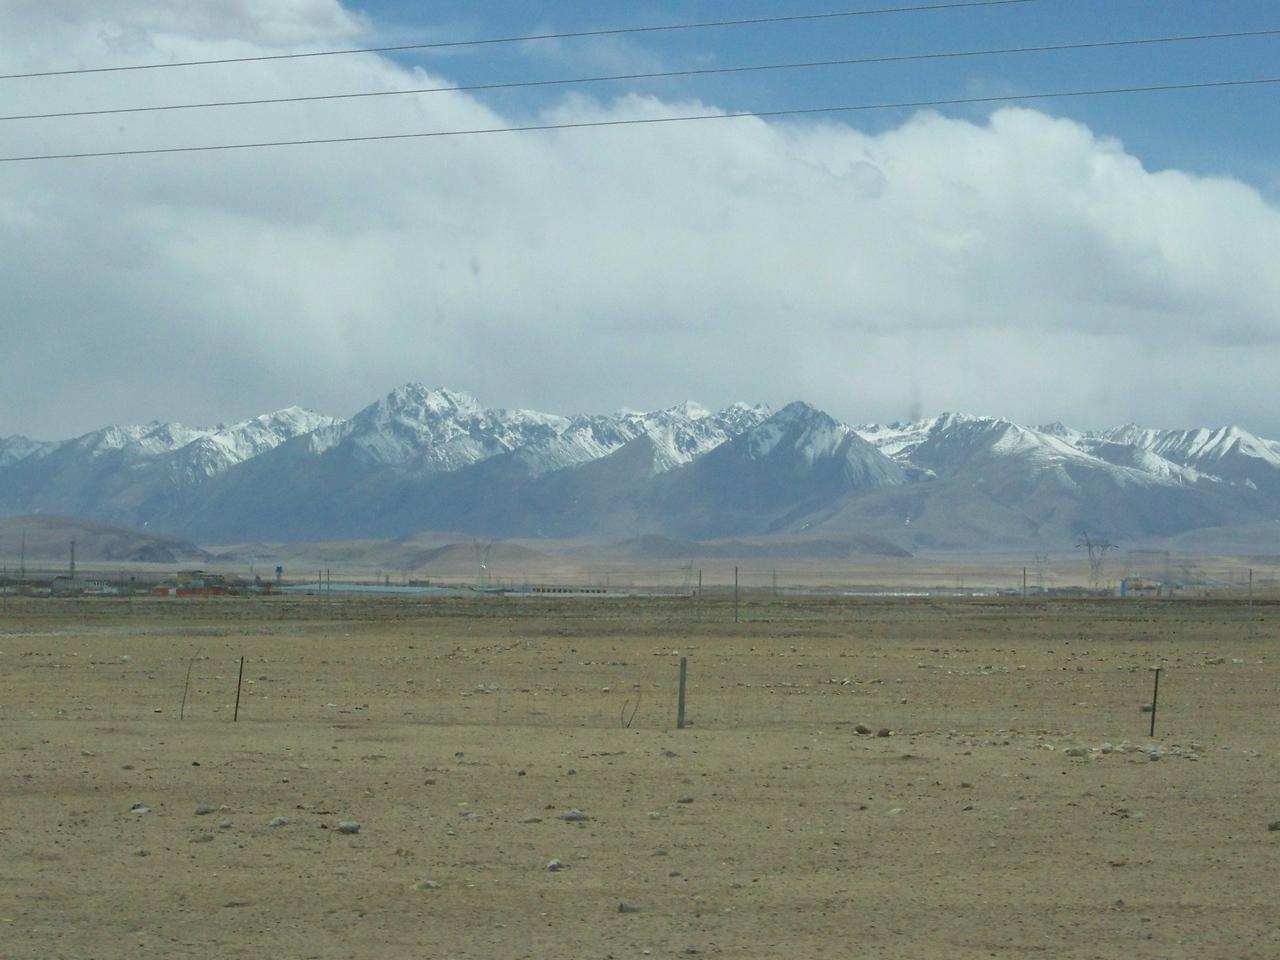 0122 - Scenery on Train Trip Between Beijing and Lhasa.JPG